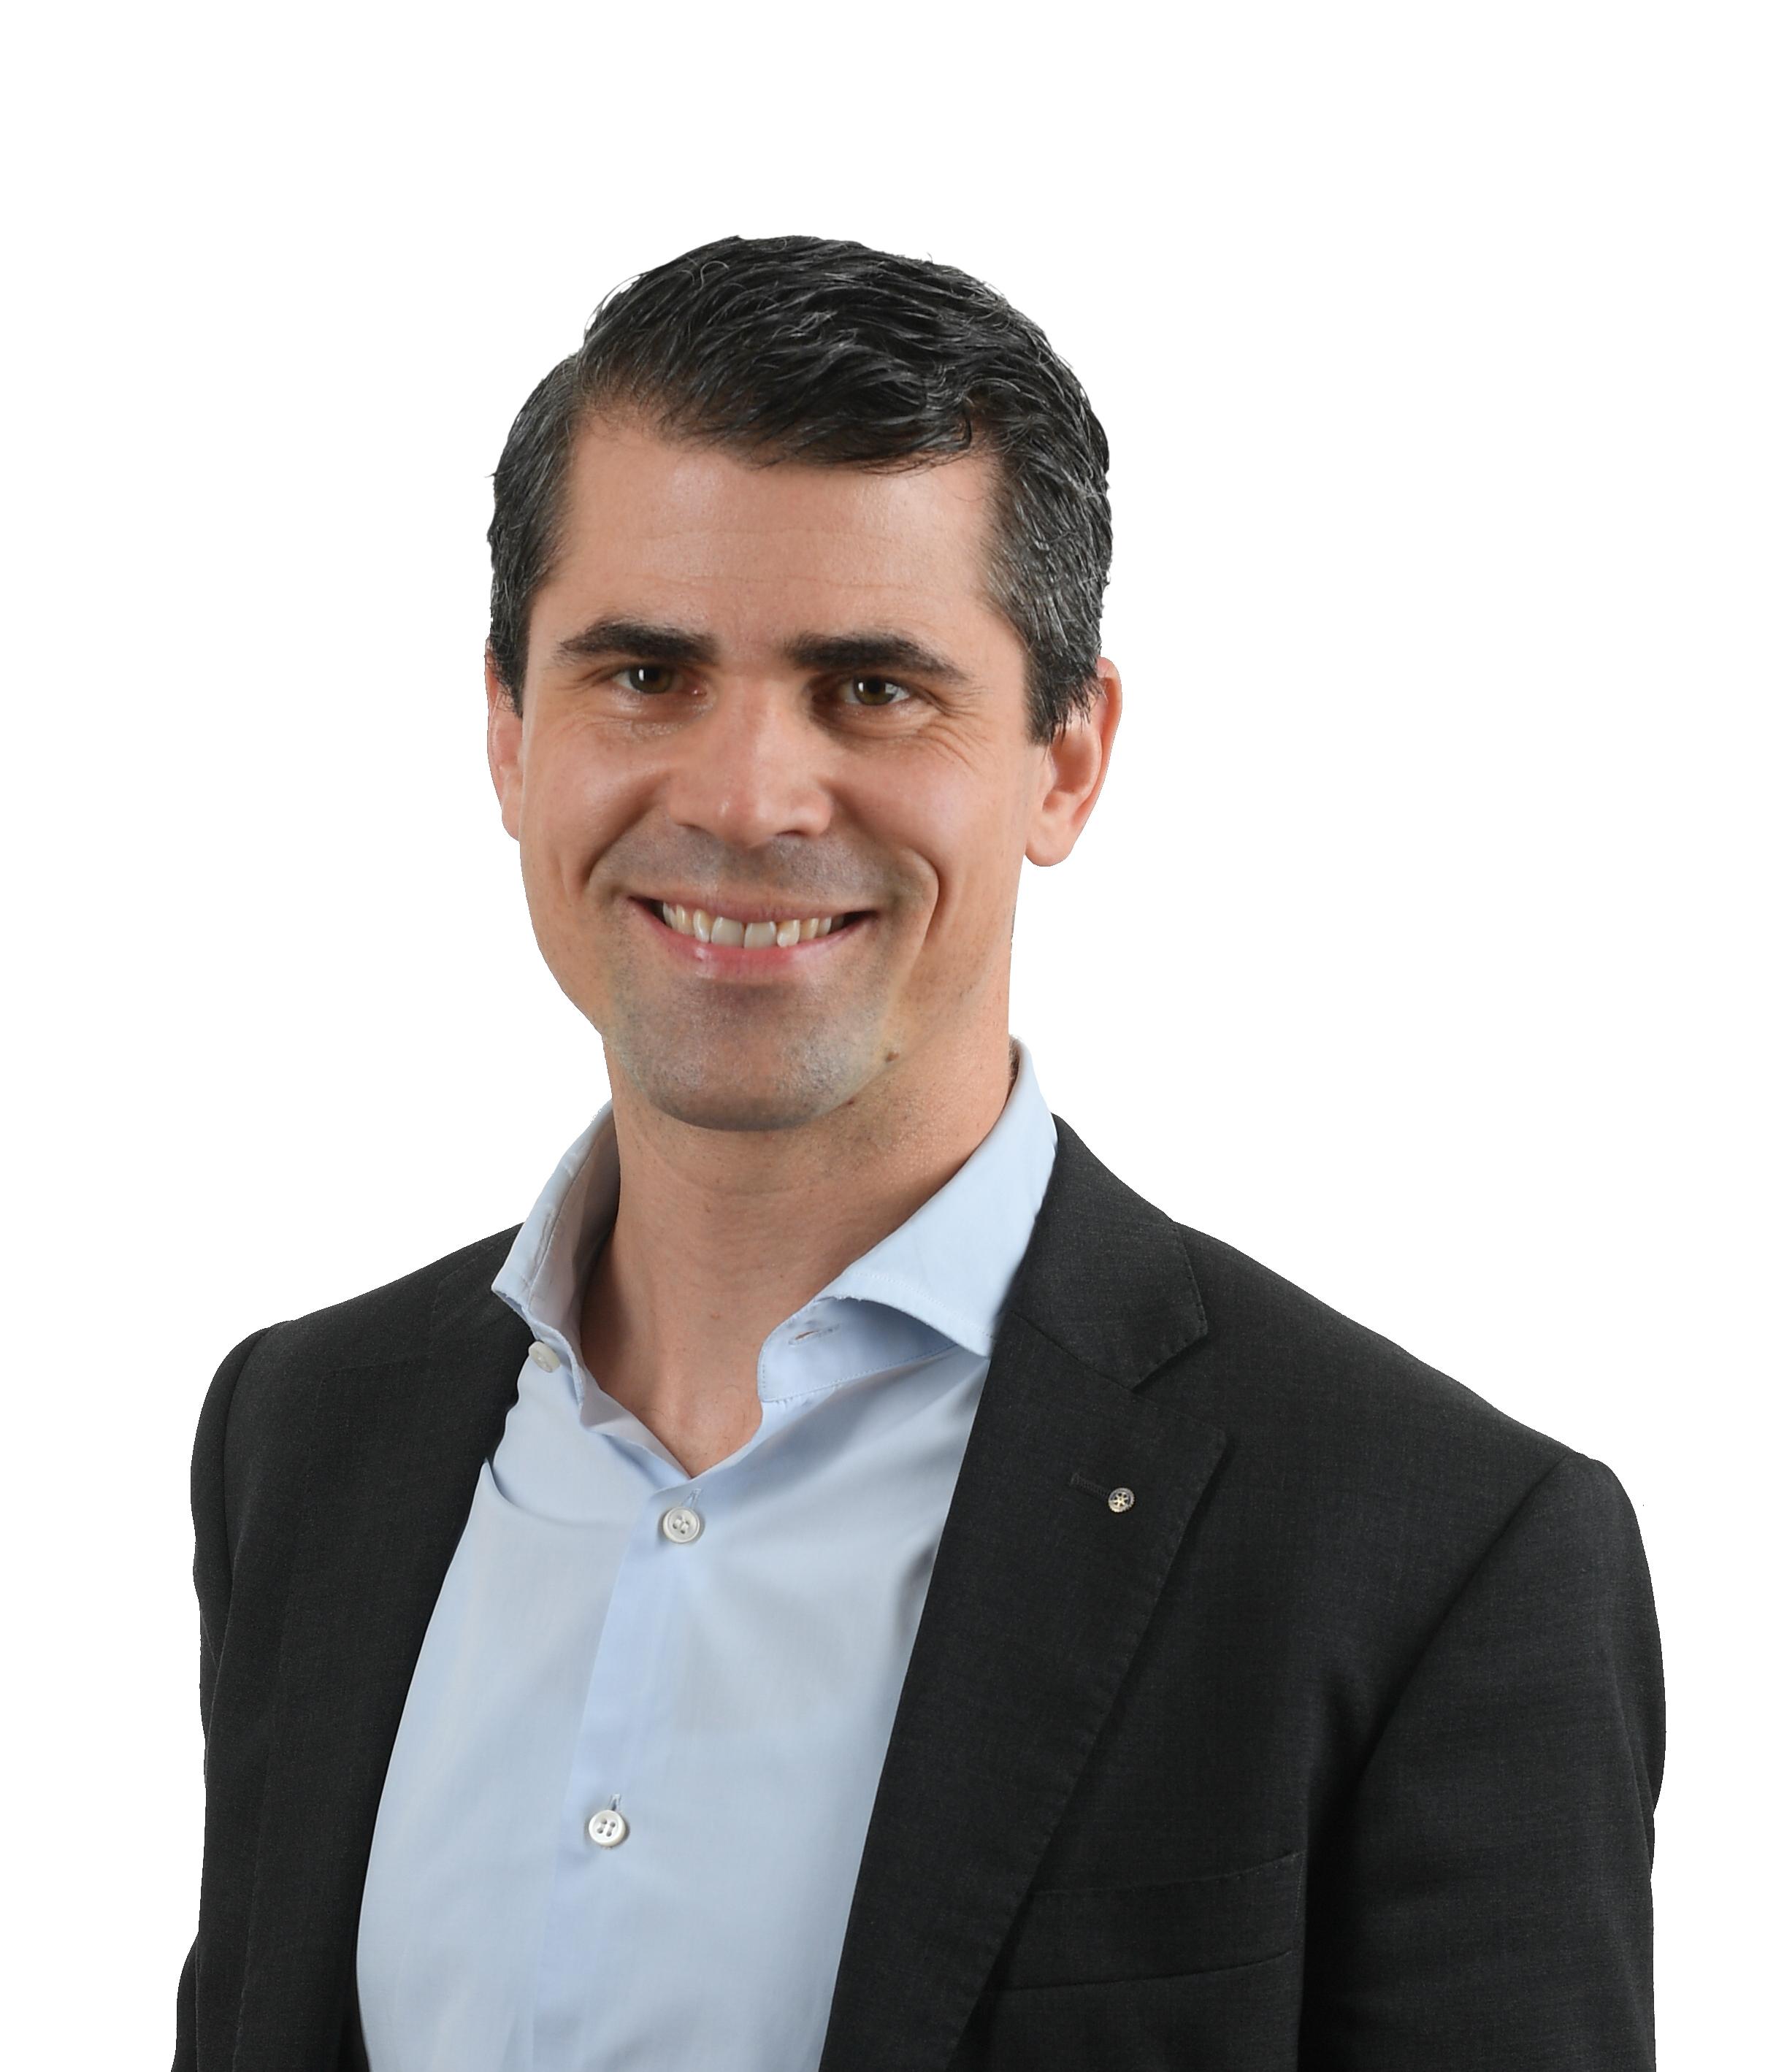 Silvan Wildhaber, lic. oec. HSG, CEO Filtex AG